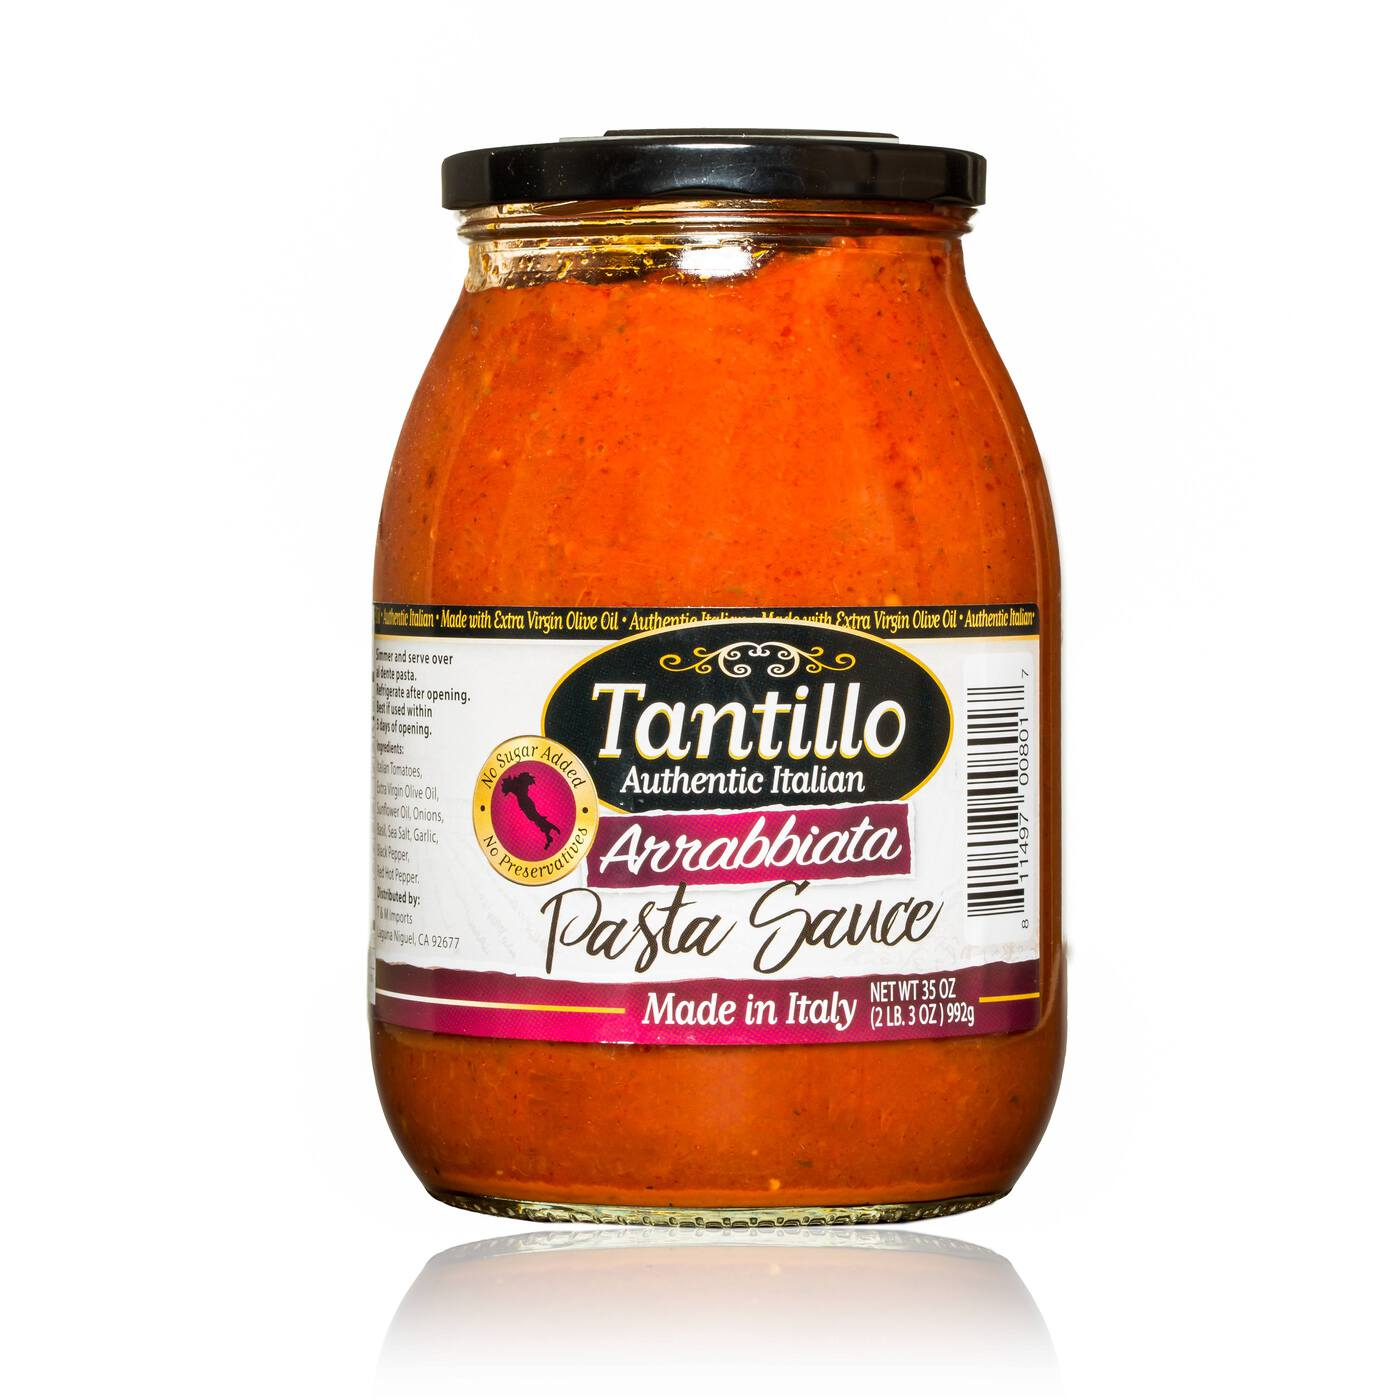 NEW* Tantillo Authentic Italian Arrabbiata Pasta Sauce – 35oz